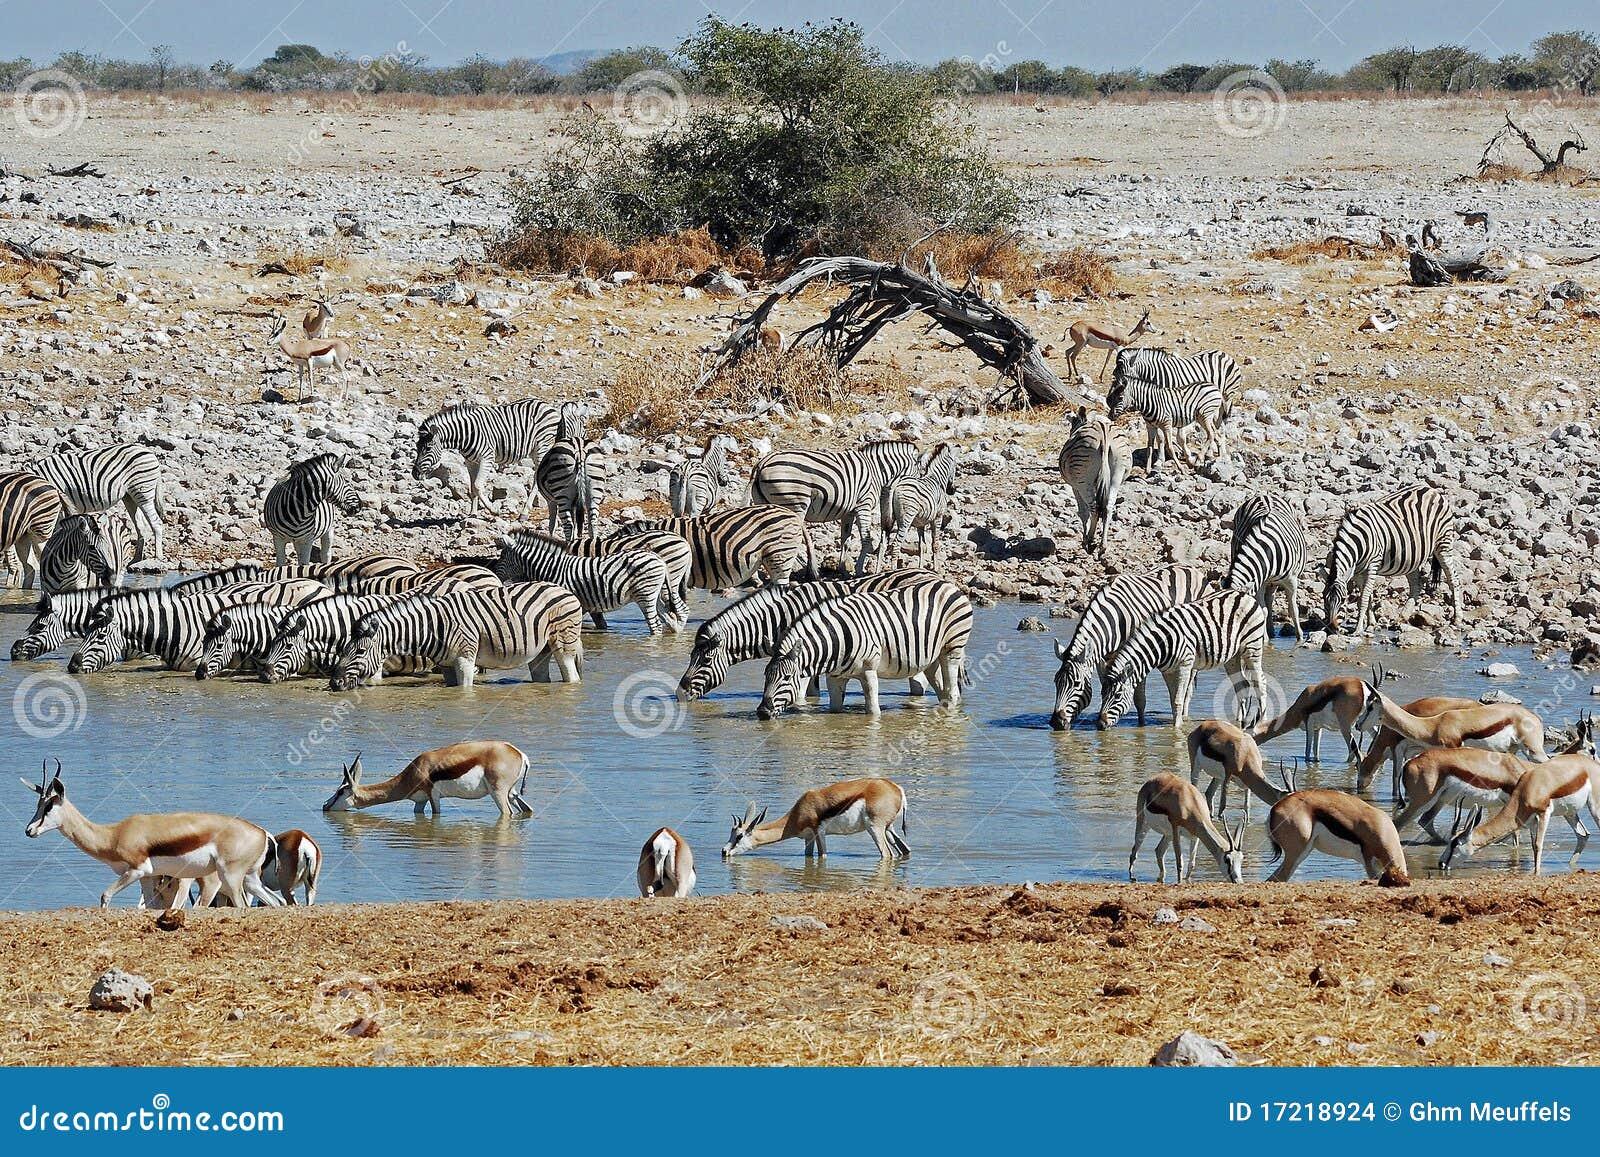 Etosha National Park landscape with pond water